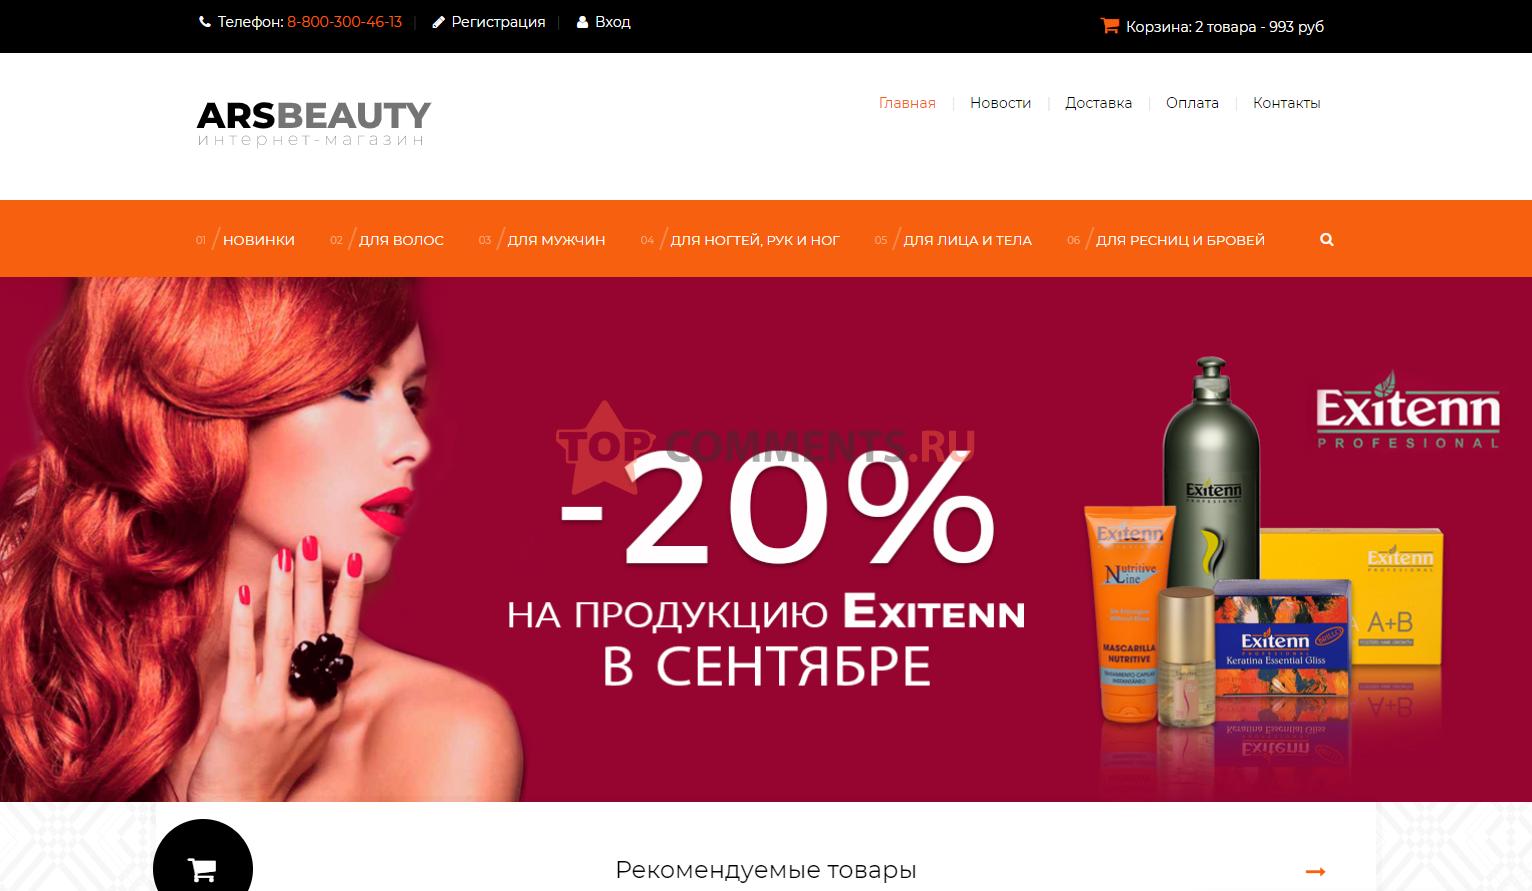 arsbeautyshop.ru - ARSBEAUTY